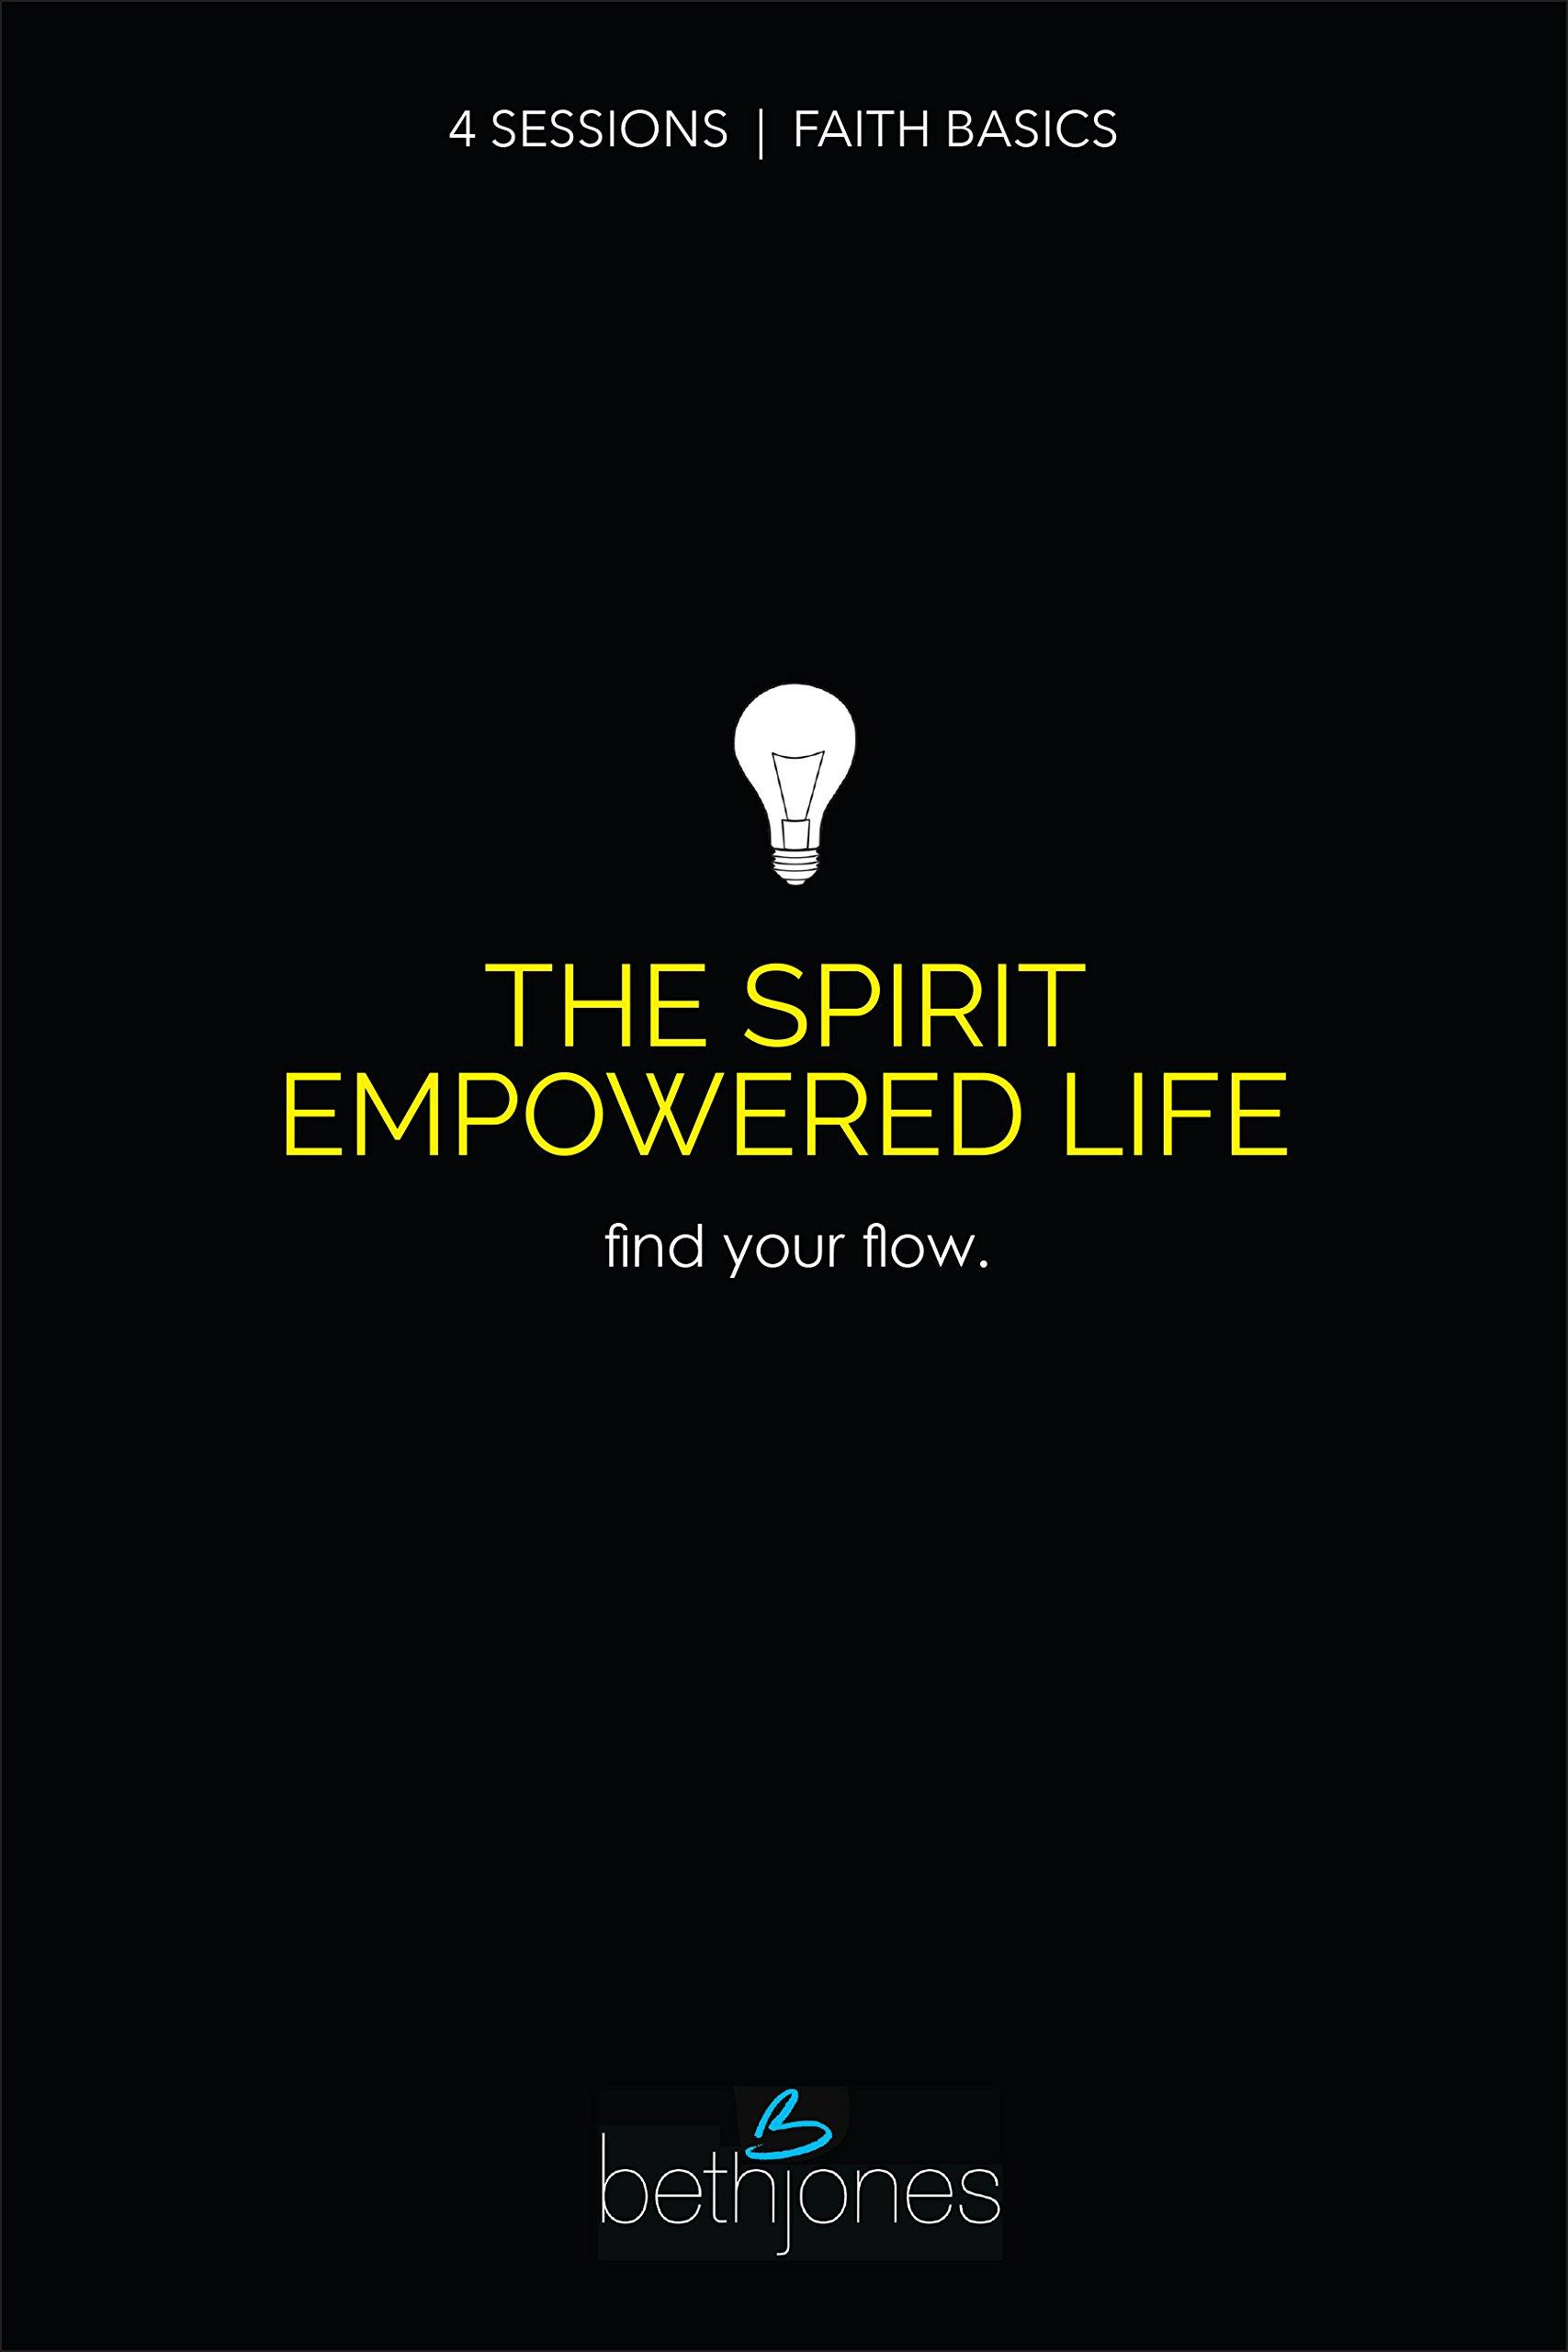 Faith basics on the spirit empowered life find your flow beth faith basics on the spirit empowered life find your flow beth jones 9781680310580 amazon books fandeluxe Choice Image